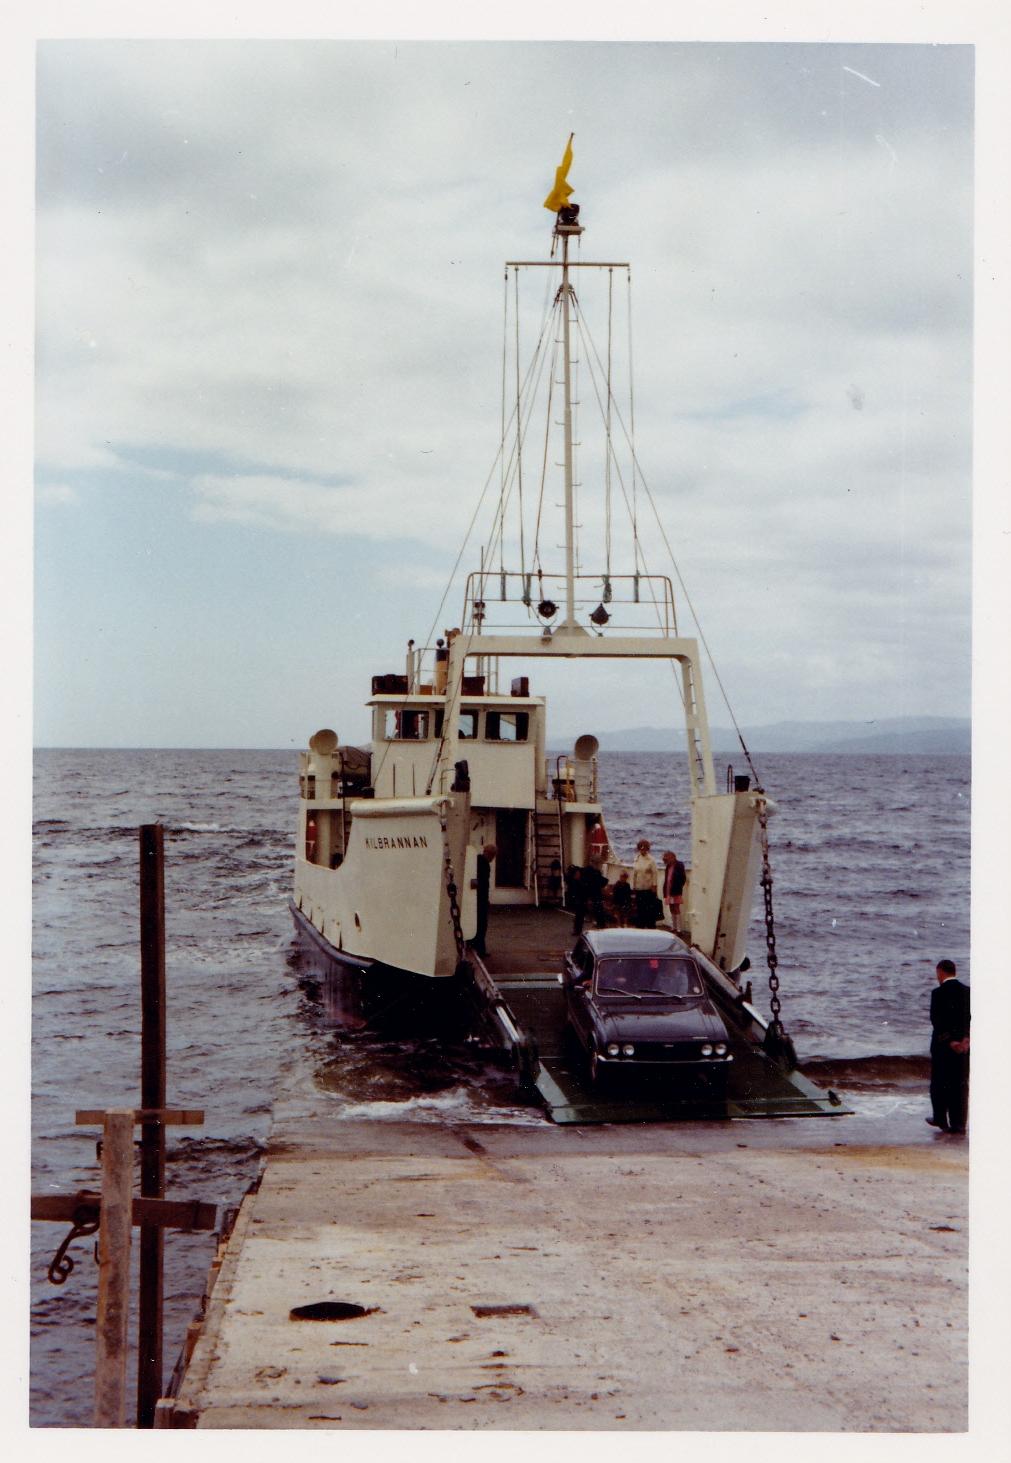 Kilbrannan loading at Claonaig (Jim Aikman Smith)